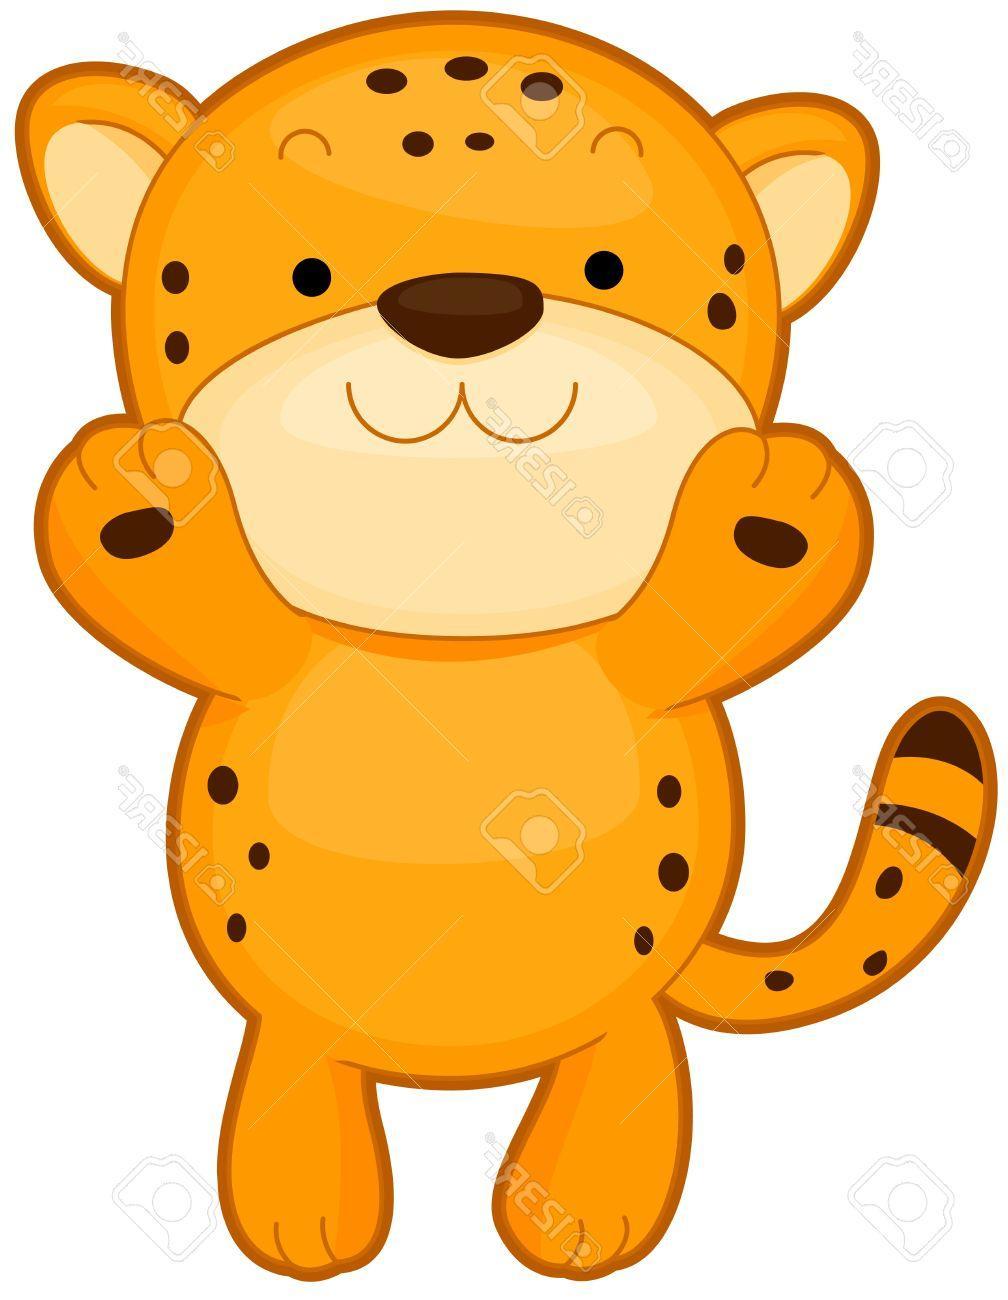 Unique Cute Cheetah Clip Art File Free » Free Vector Art, Images.